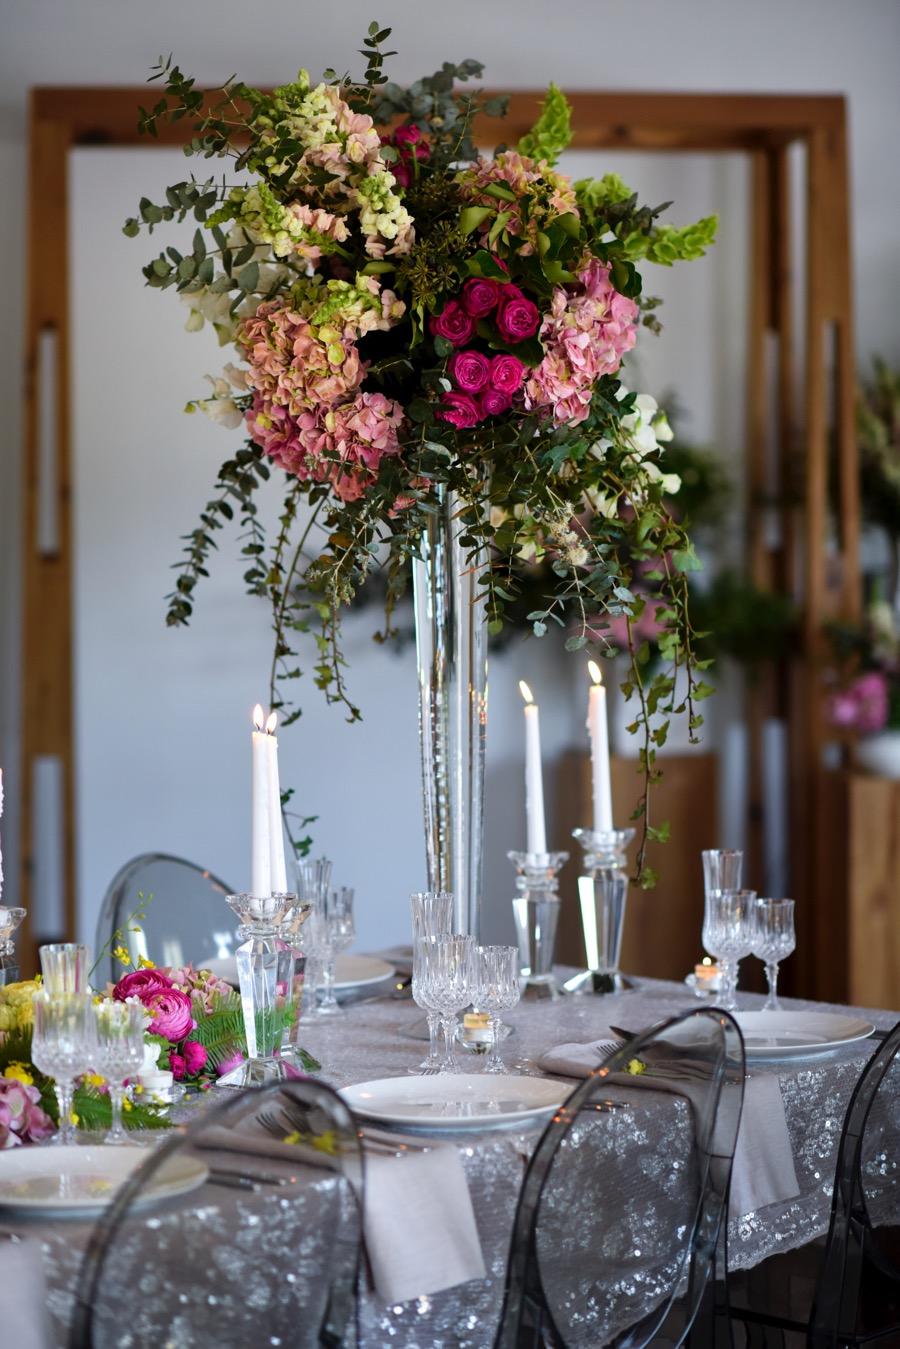 elegant glass vases of summery blooms, perfect for an indoor Darwin wedding reception, created by Beija Flor, Darwin wedding expert florists